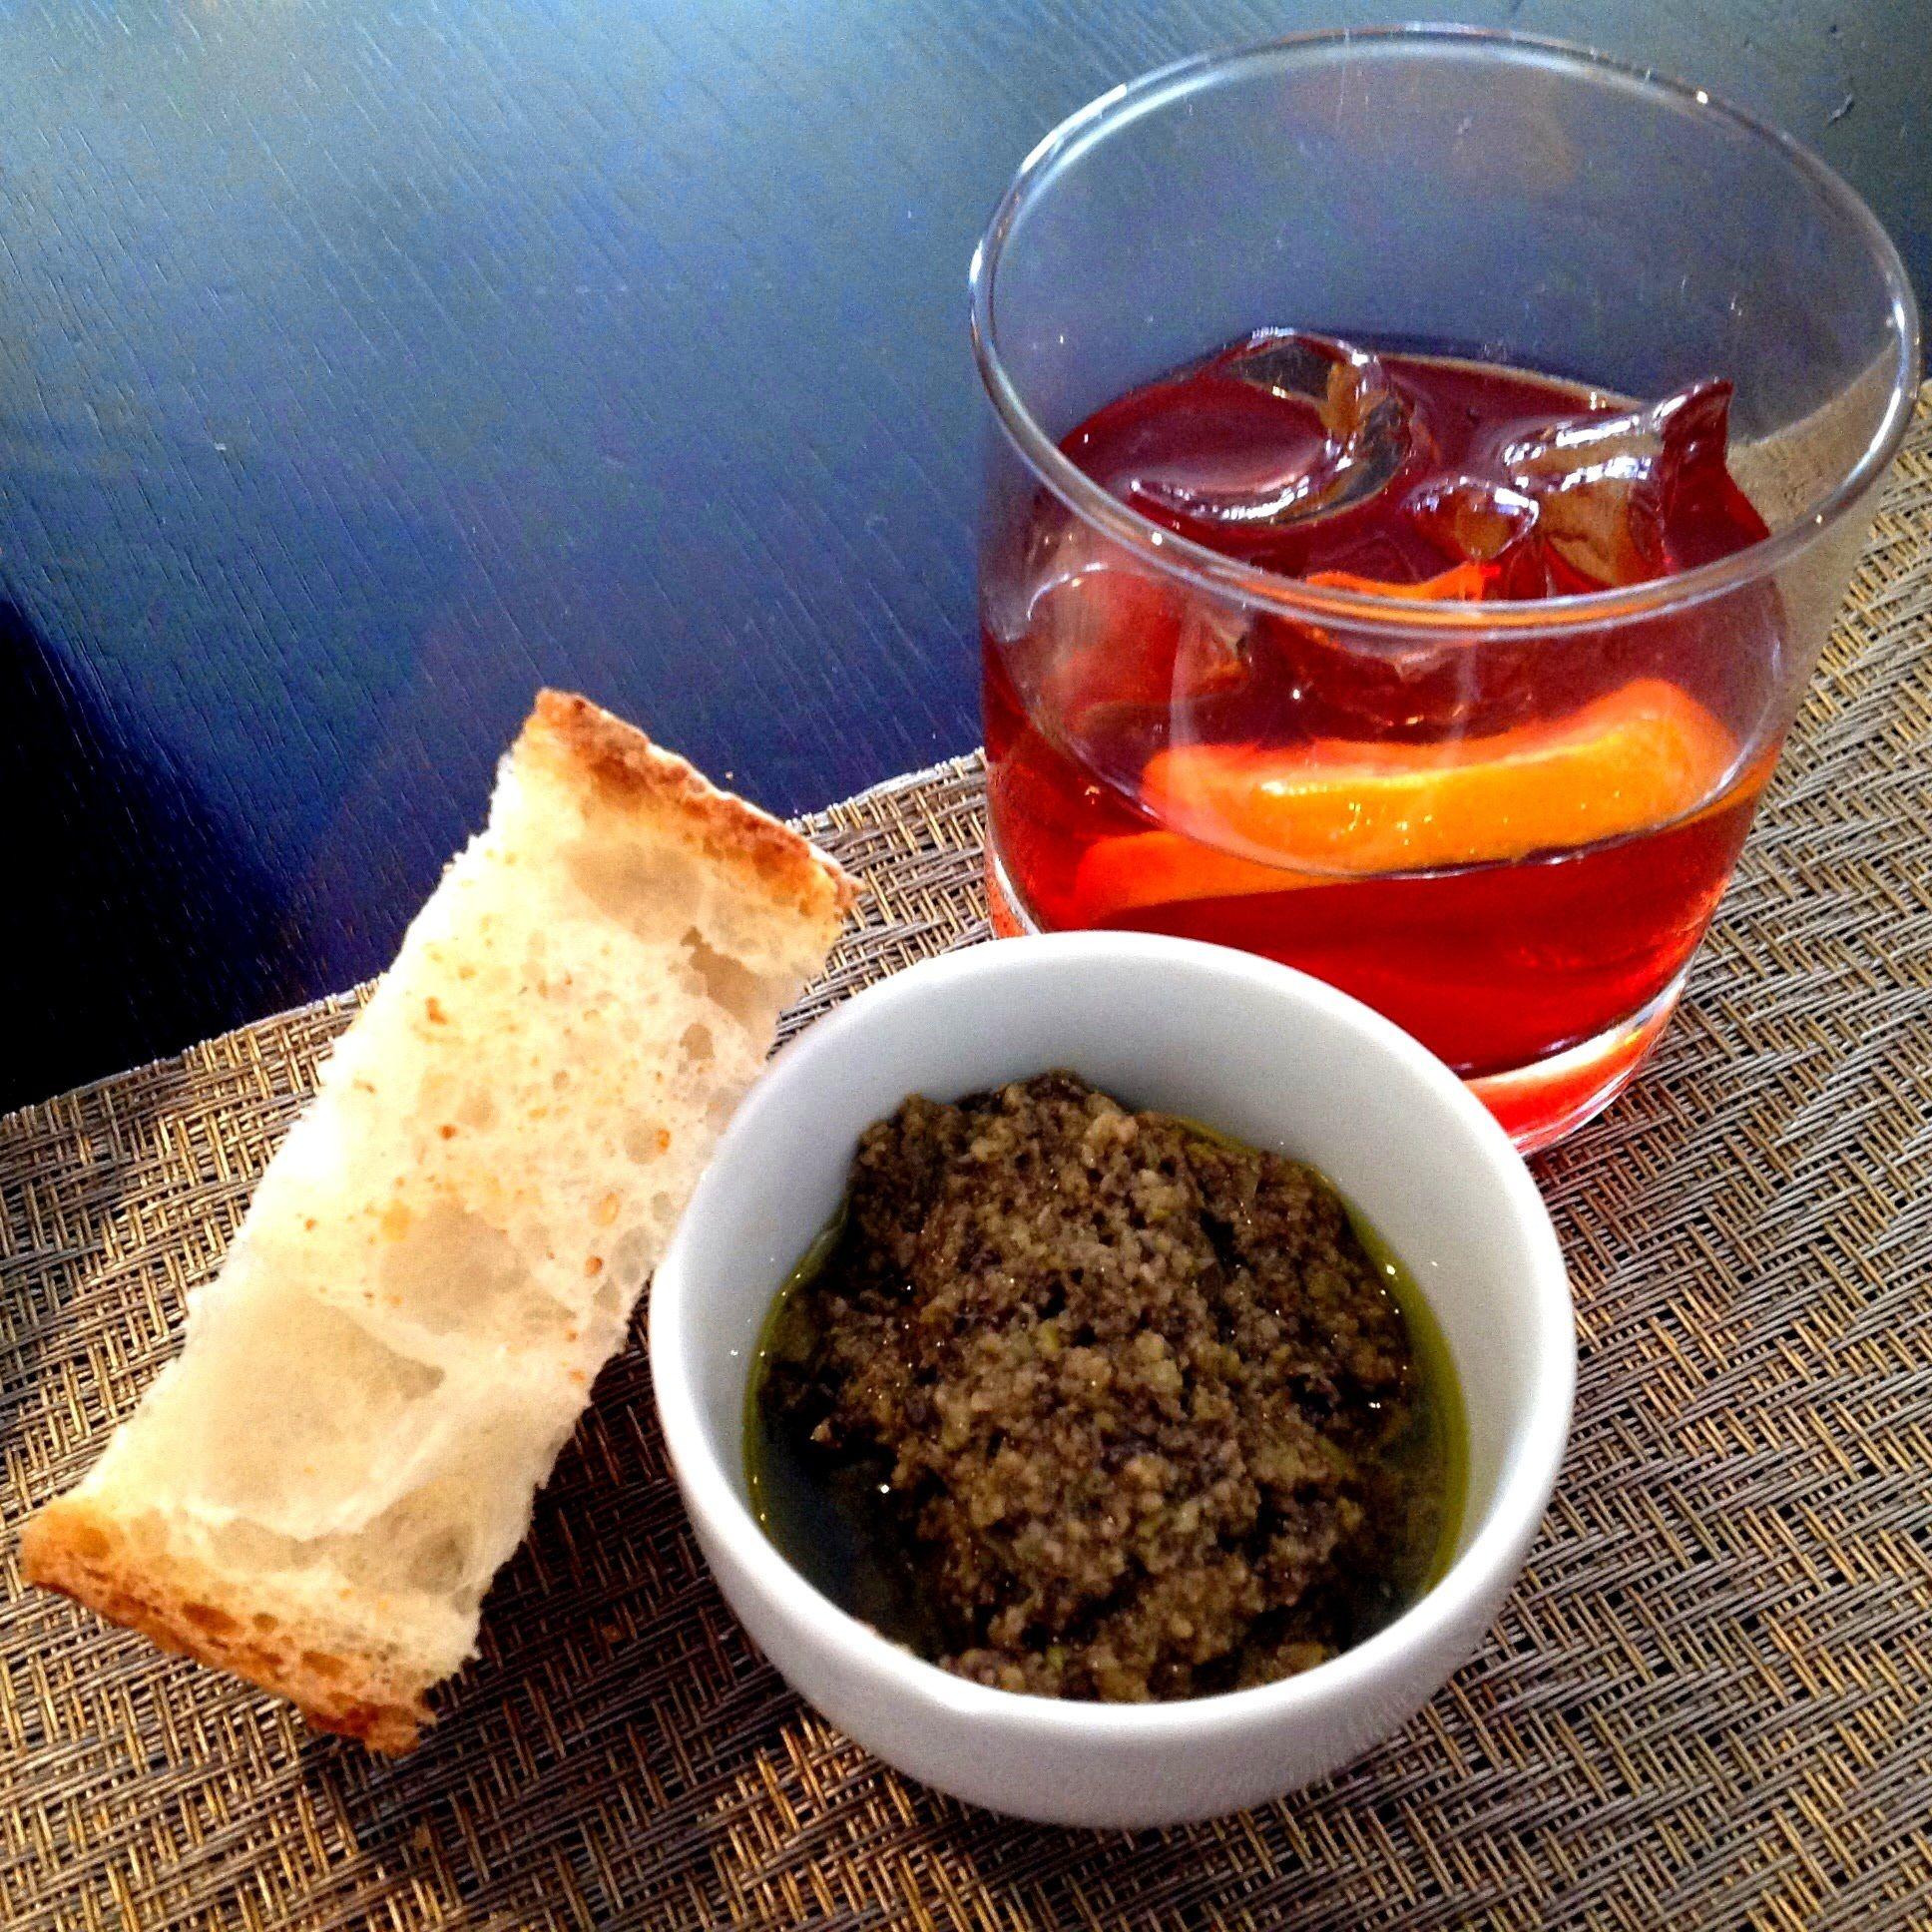 Negroni, pan y pasta de aceituna negra